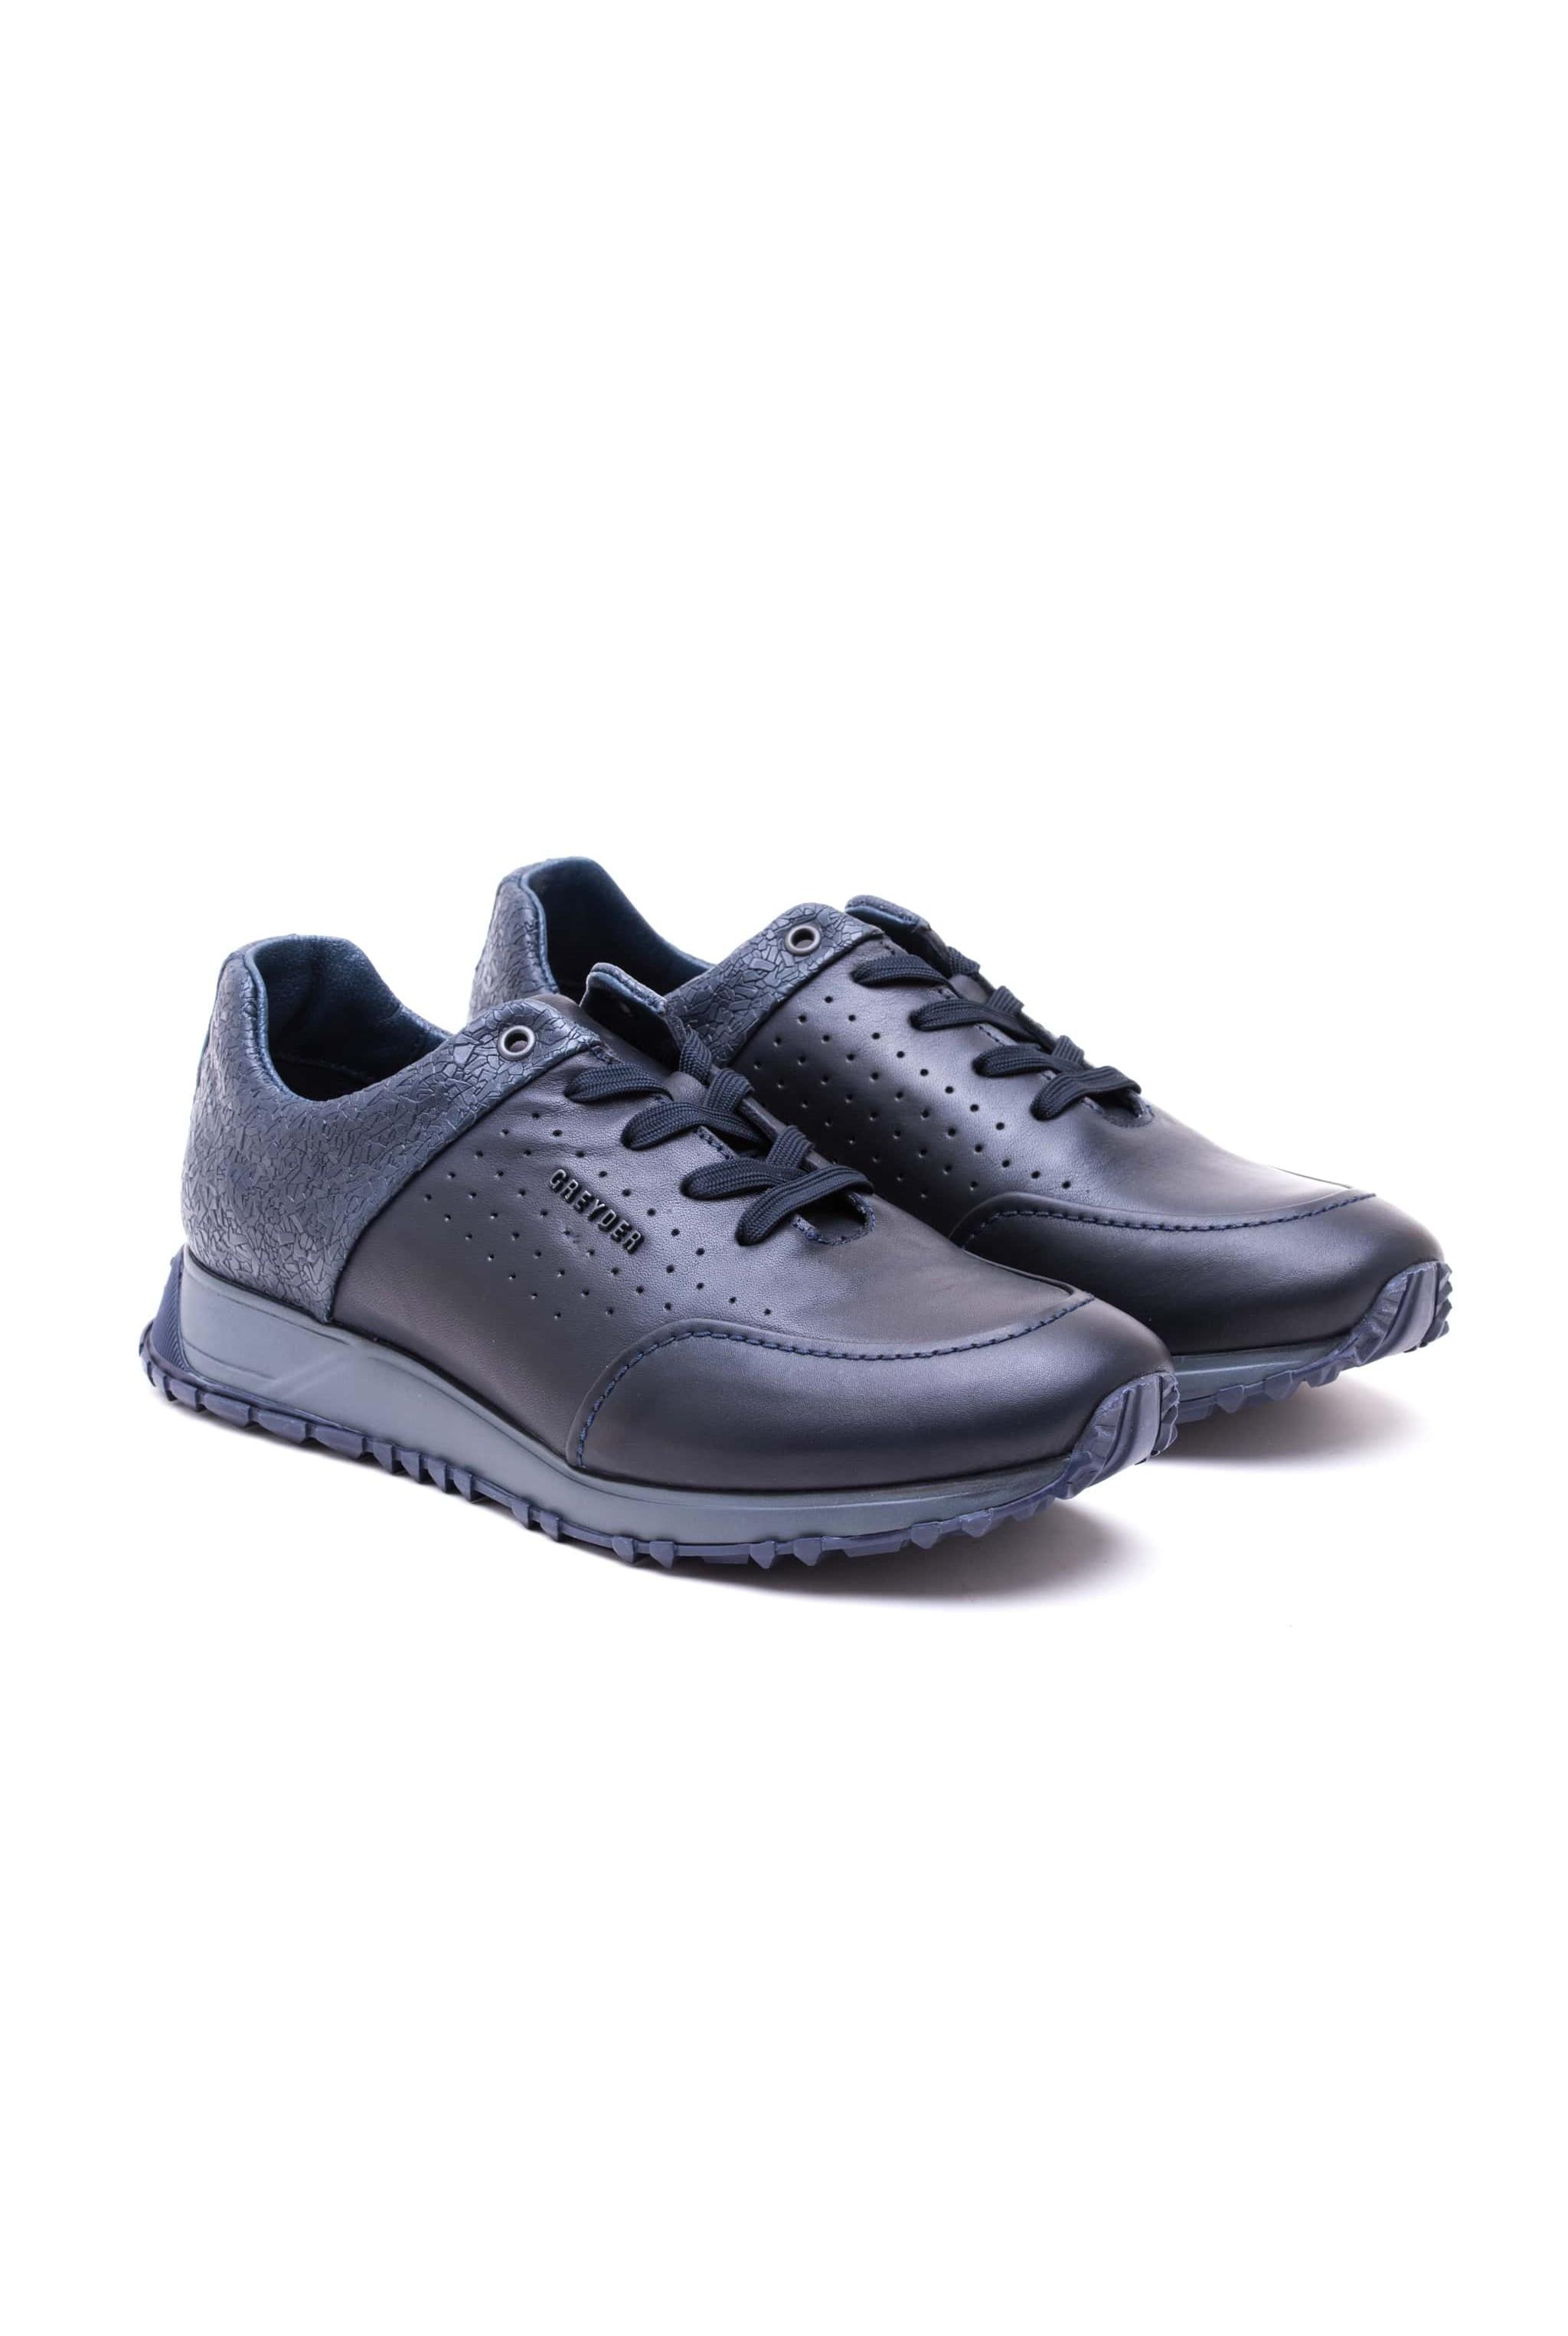 61dce0cbf بوط رجالي رياضي - ازرق داكن | غرايدر - Greyder | تسوق اون لاين في تركيا |  سوق ادويت